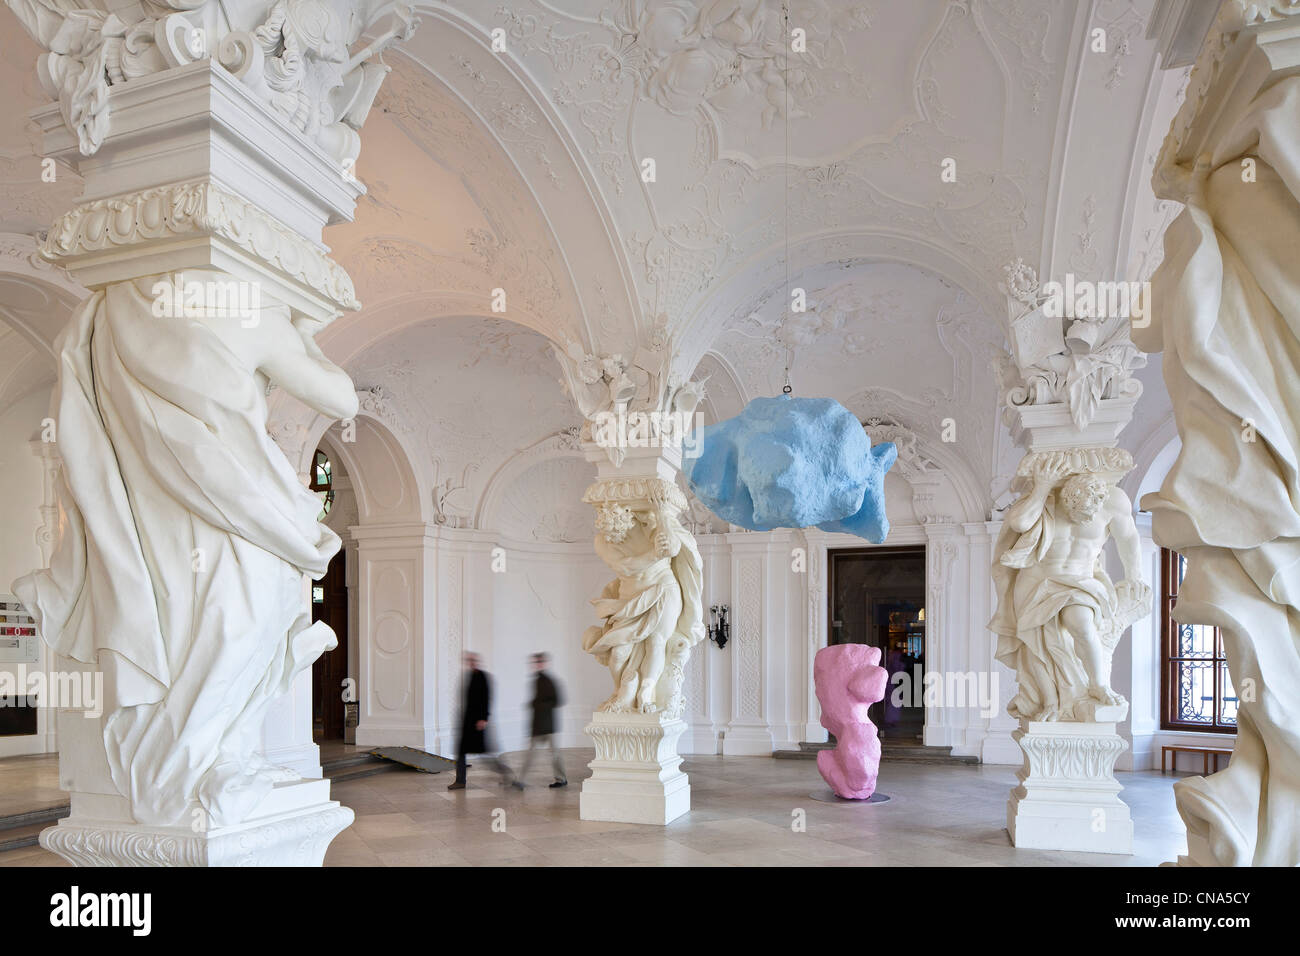 Austria, Vienna, Belvedere Palace Baroque directed by Johann Lukas von Hildebrandt in the early 18th century, Upper - Stock Image